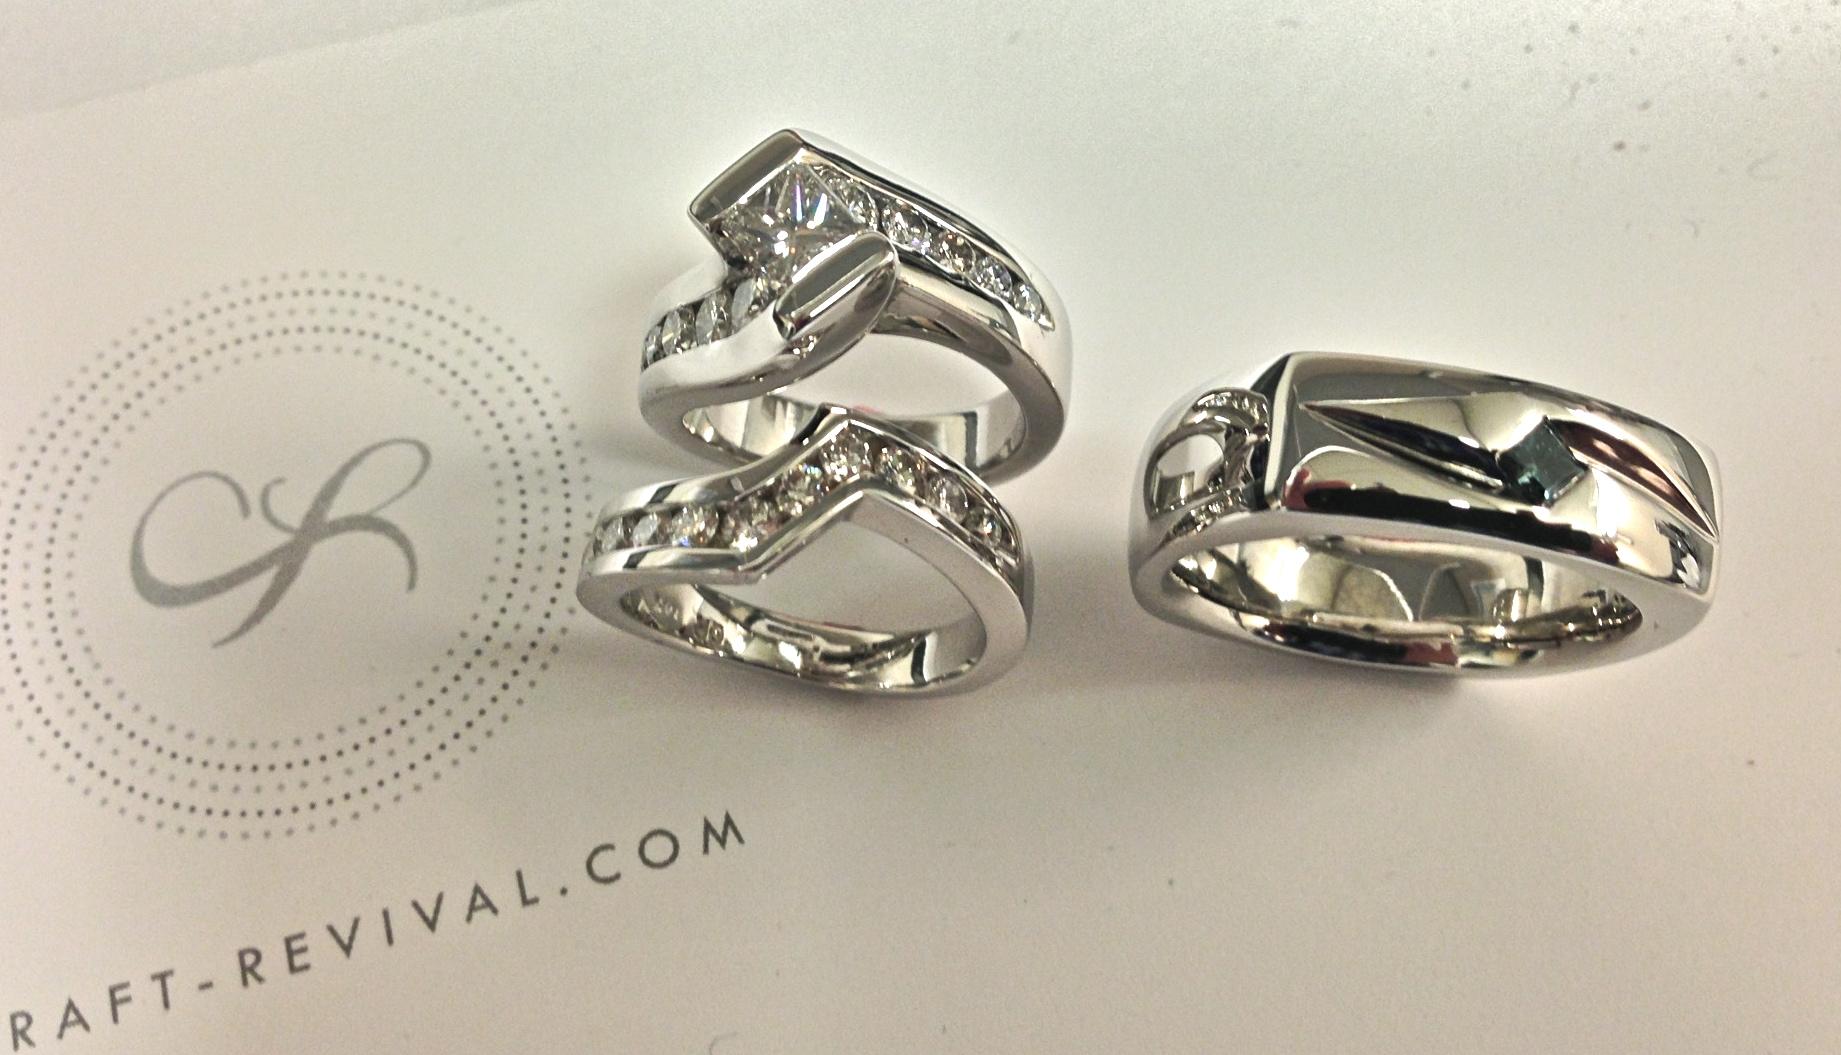 unique-craft-revival-custom-engagement-ring-wedding-set-white-gold-modern-design-jewelry-store-grand-rapids